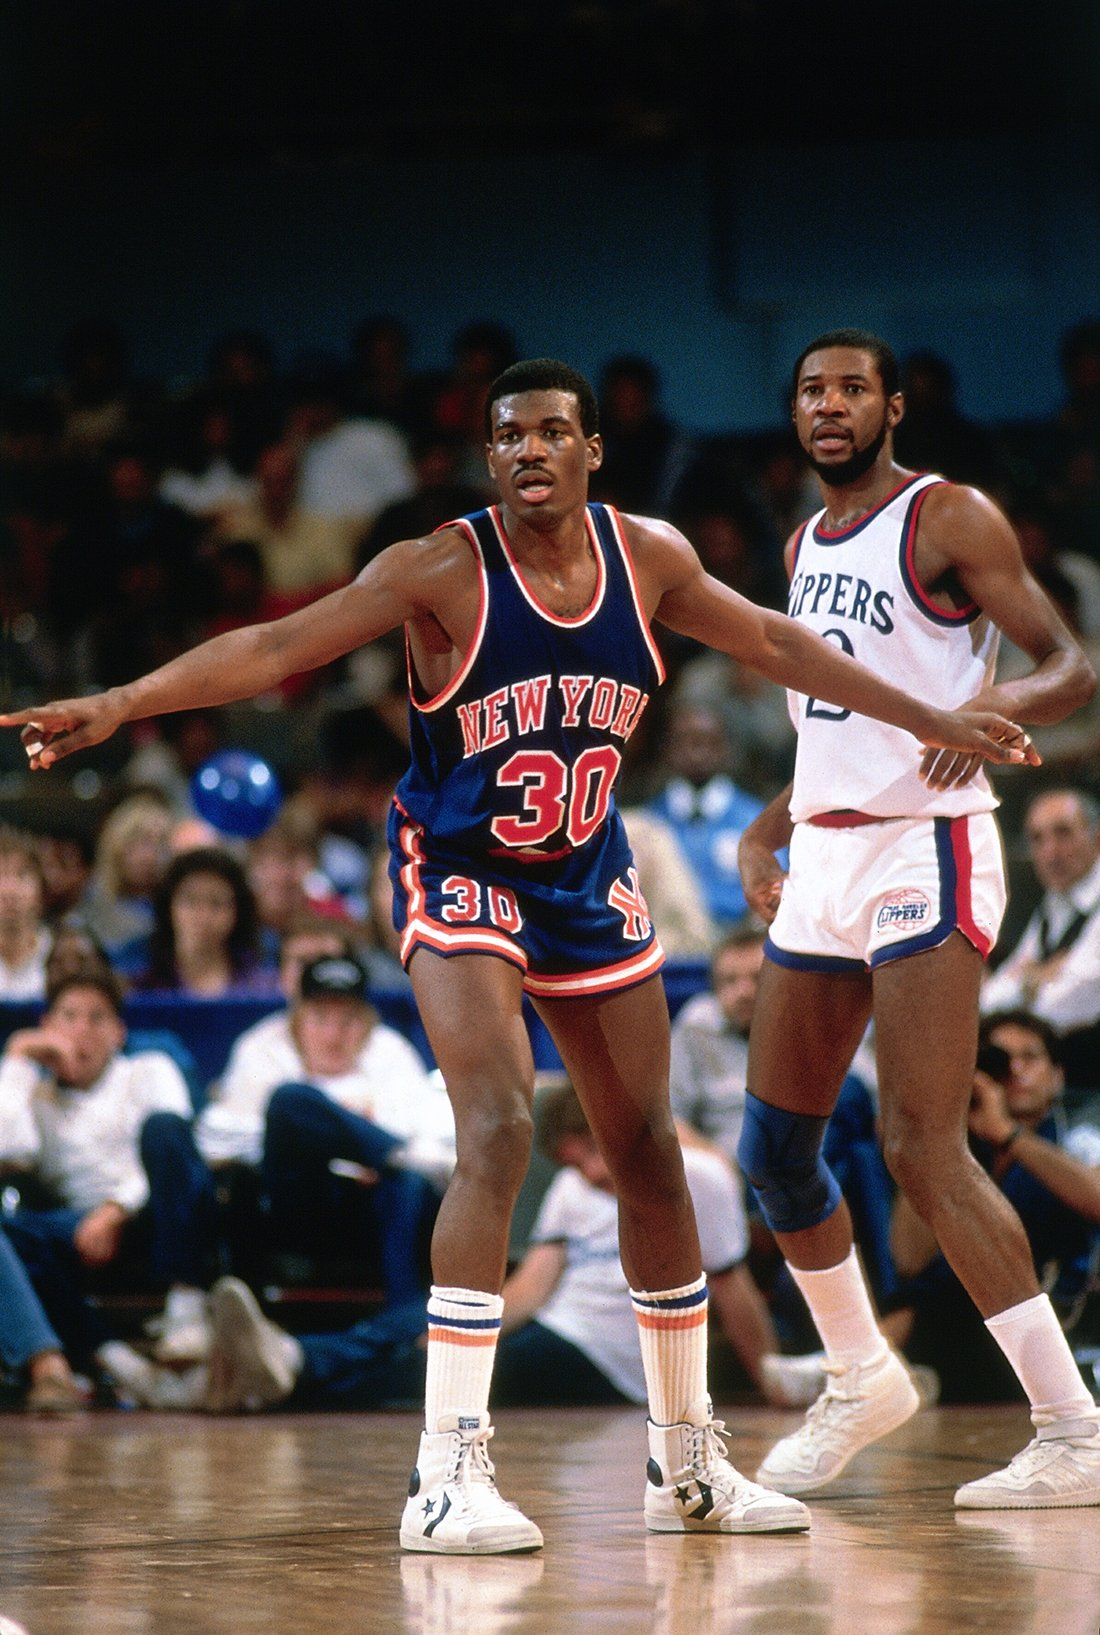 Bernard King Copyright 1984 NBAE (Photo by Ron Koch/NBAE via Getty Images)